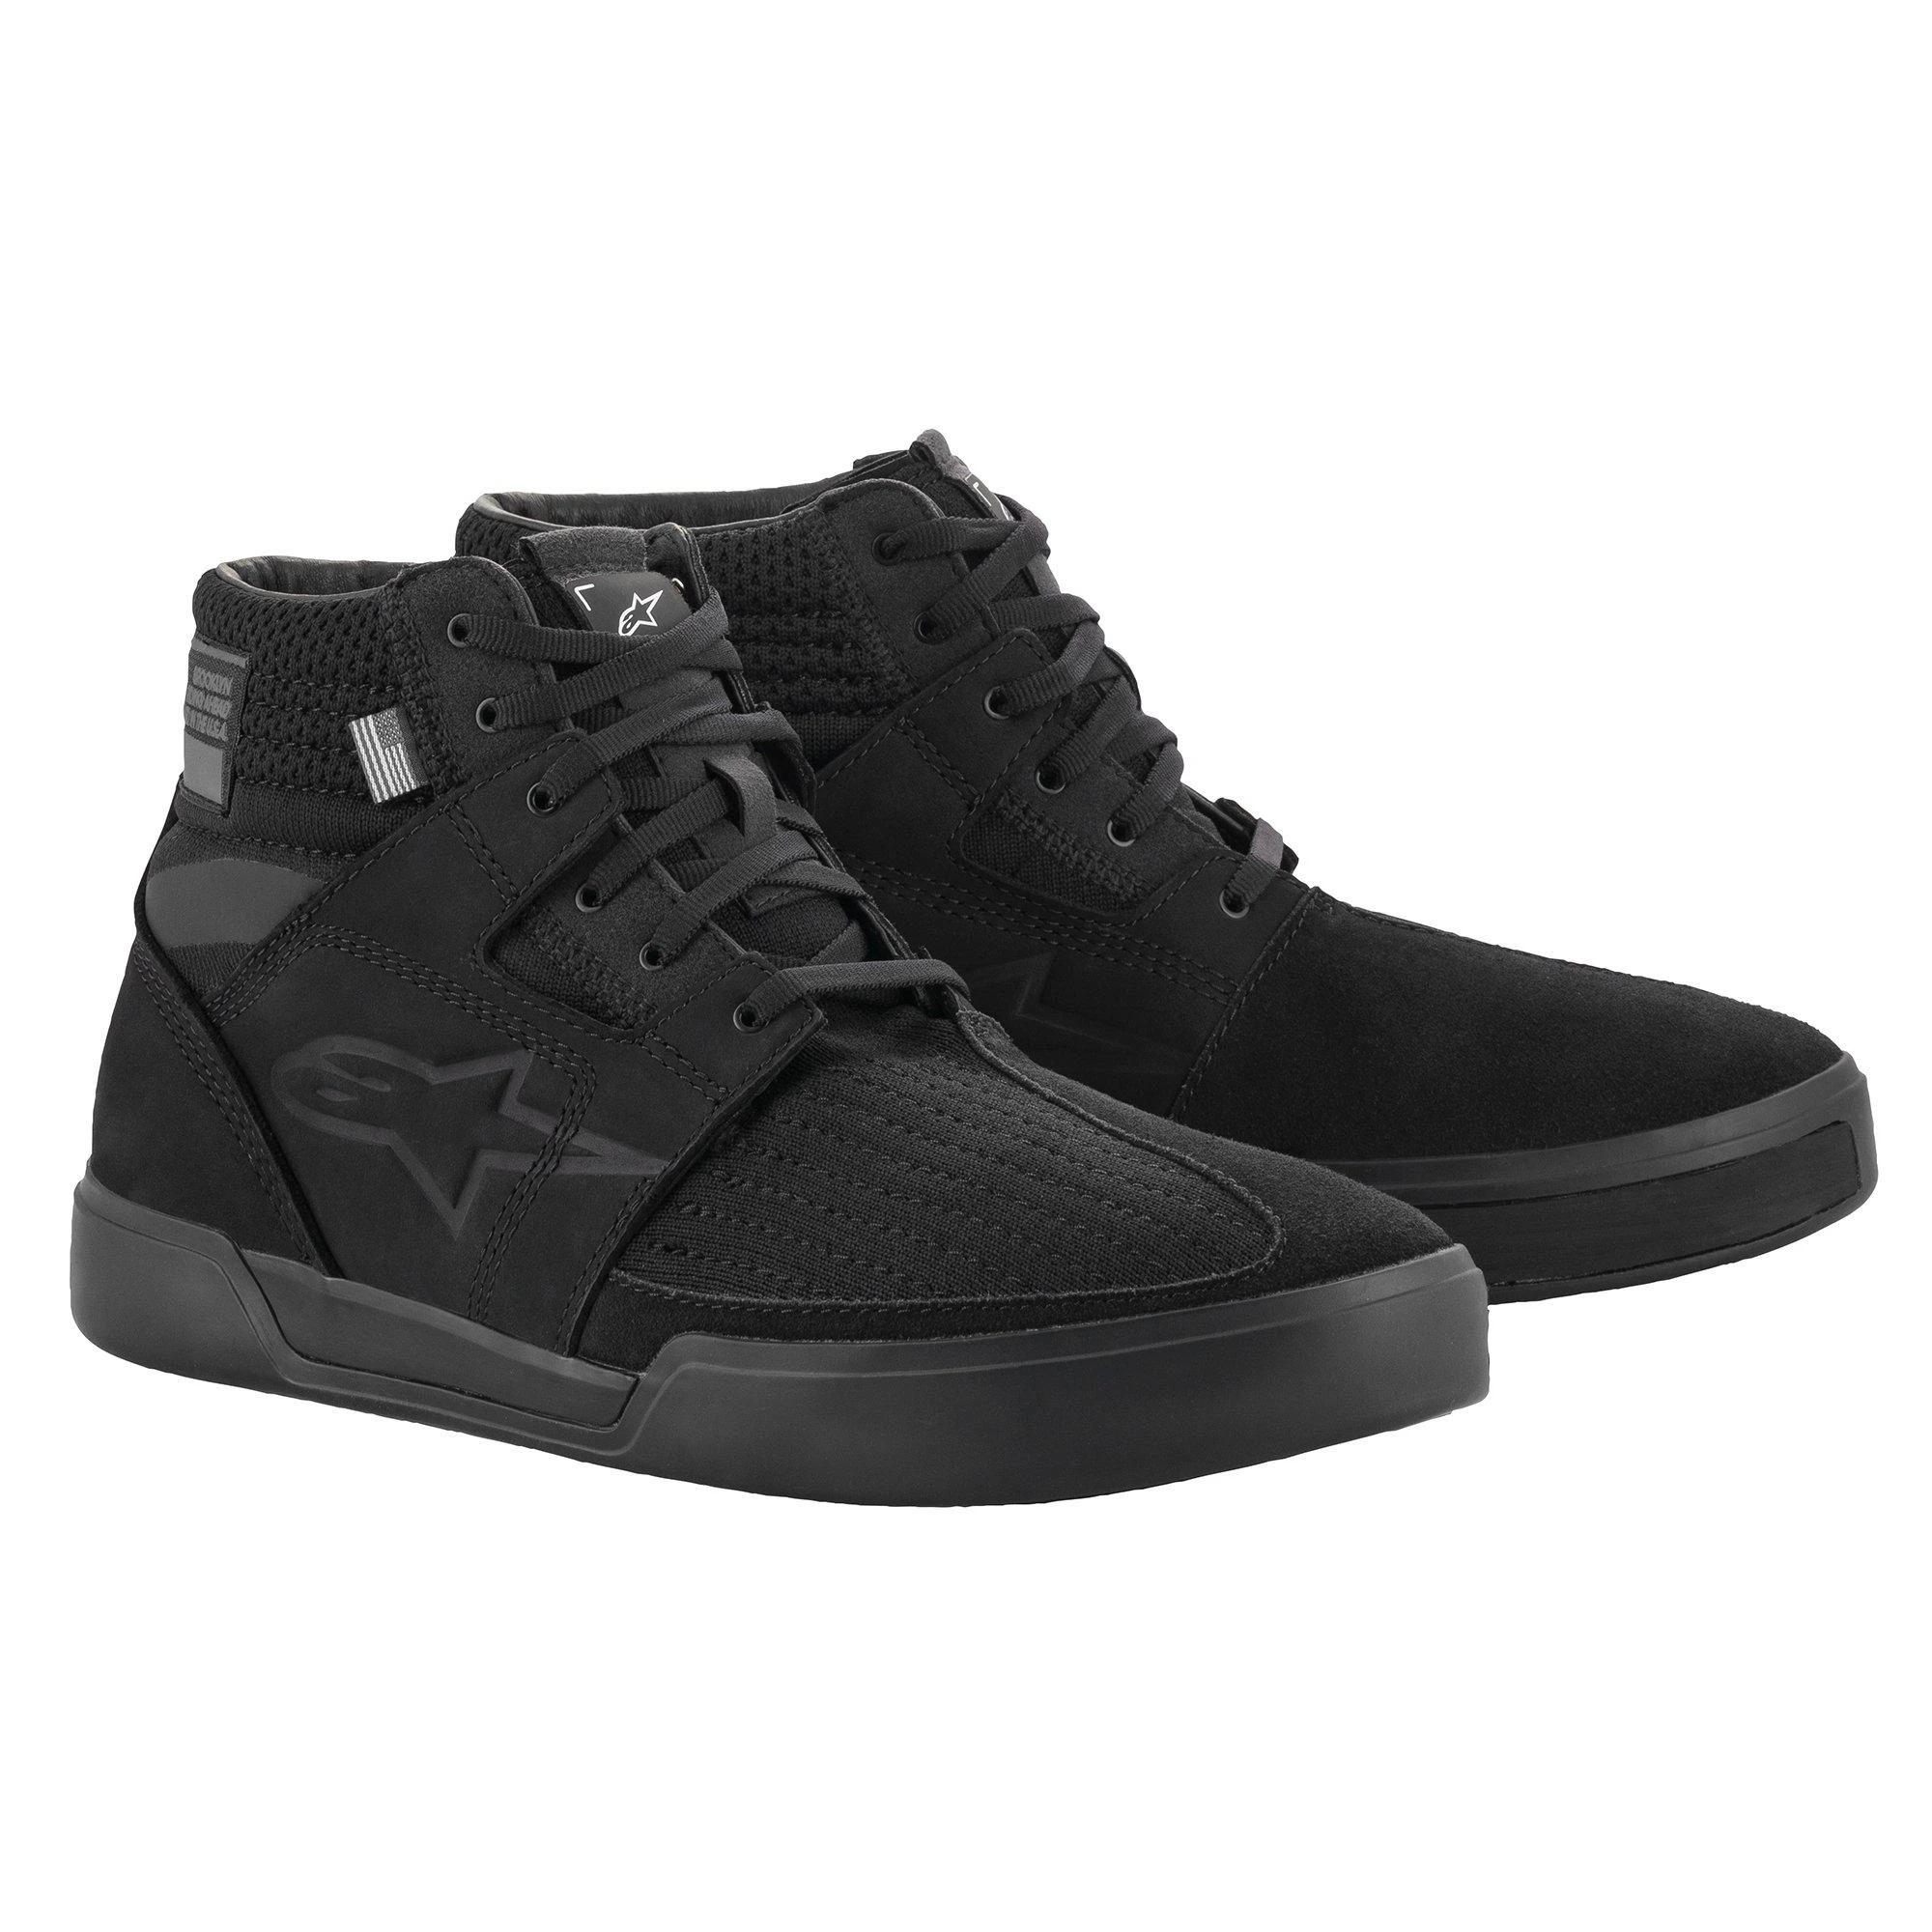 Alpinestars Primer Black Riding Shoes